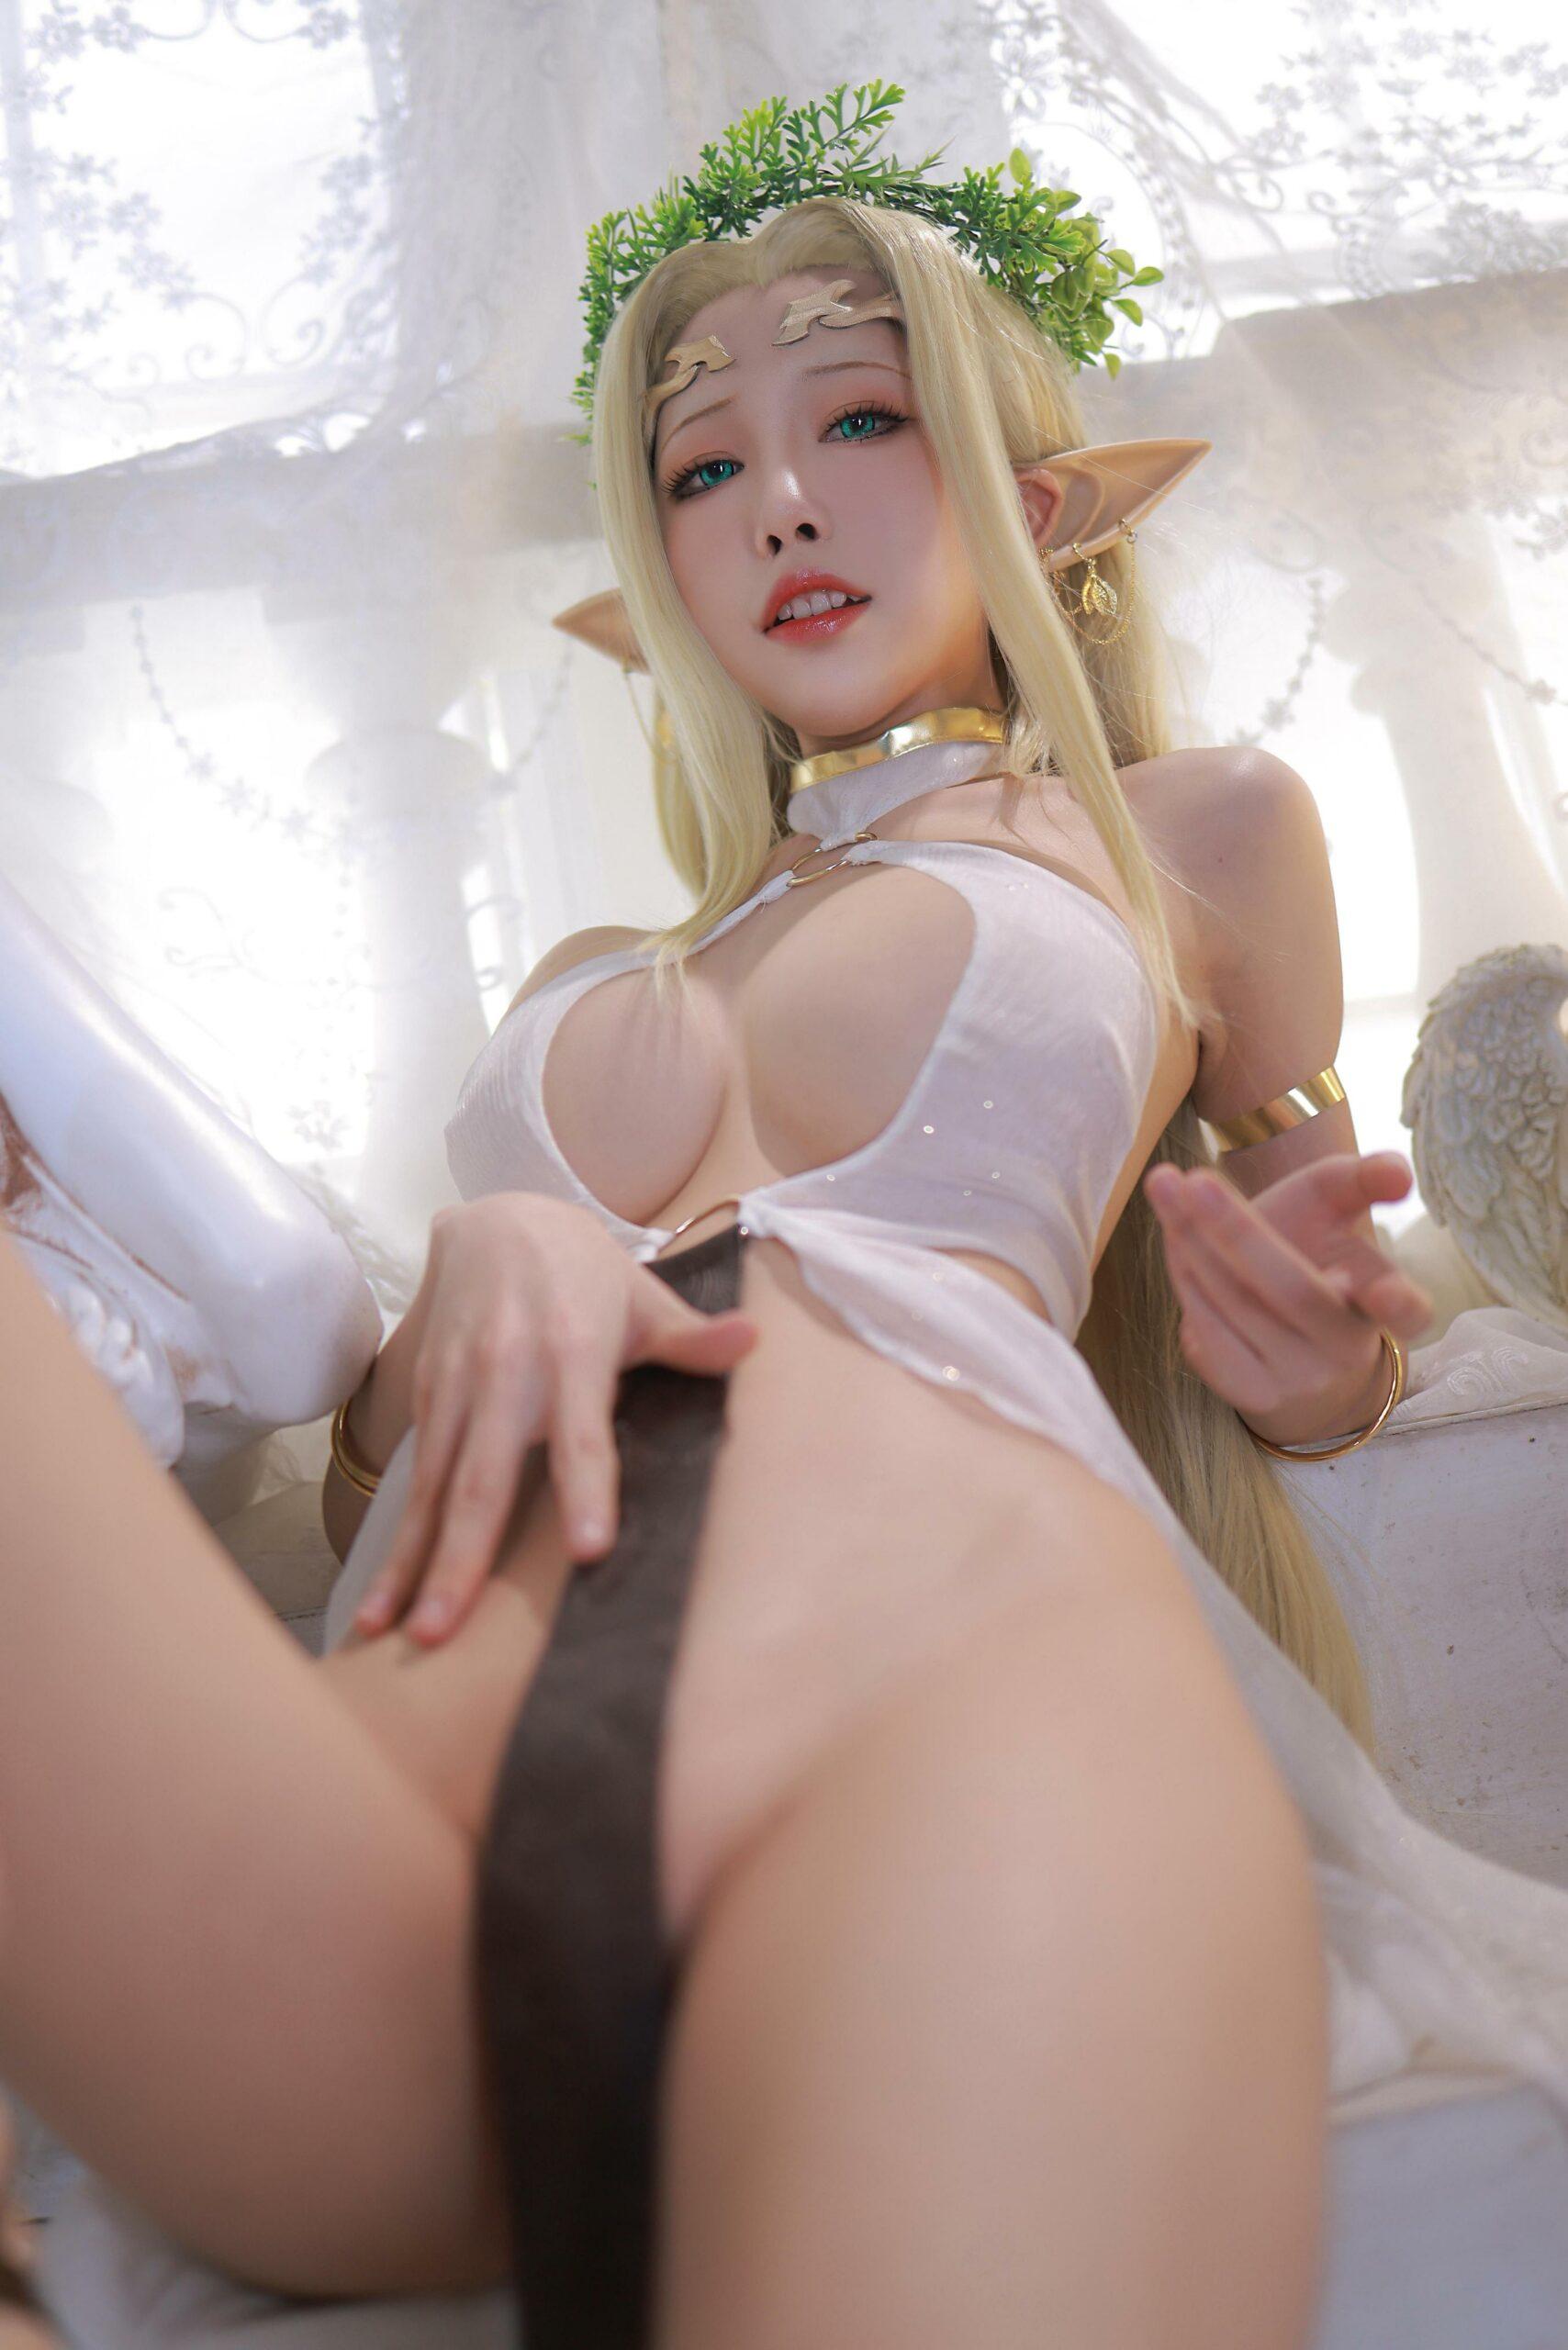 Kuroinu Celestine Cosplay by Aqua 67